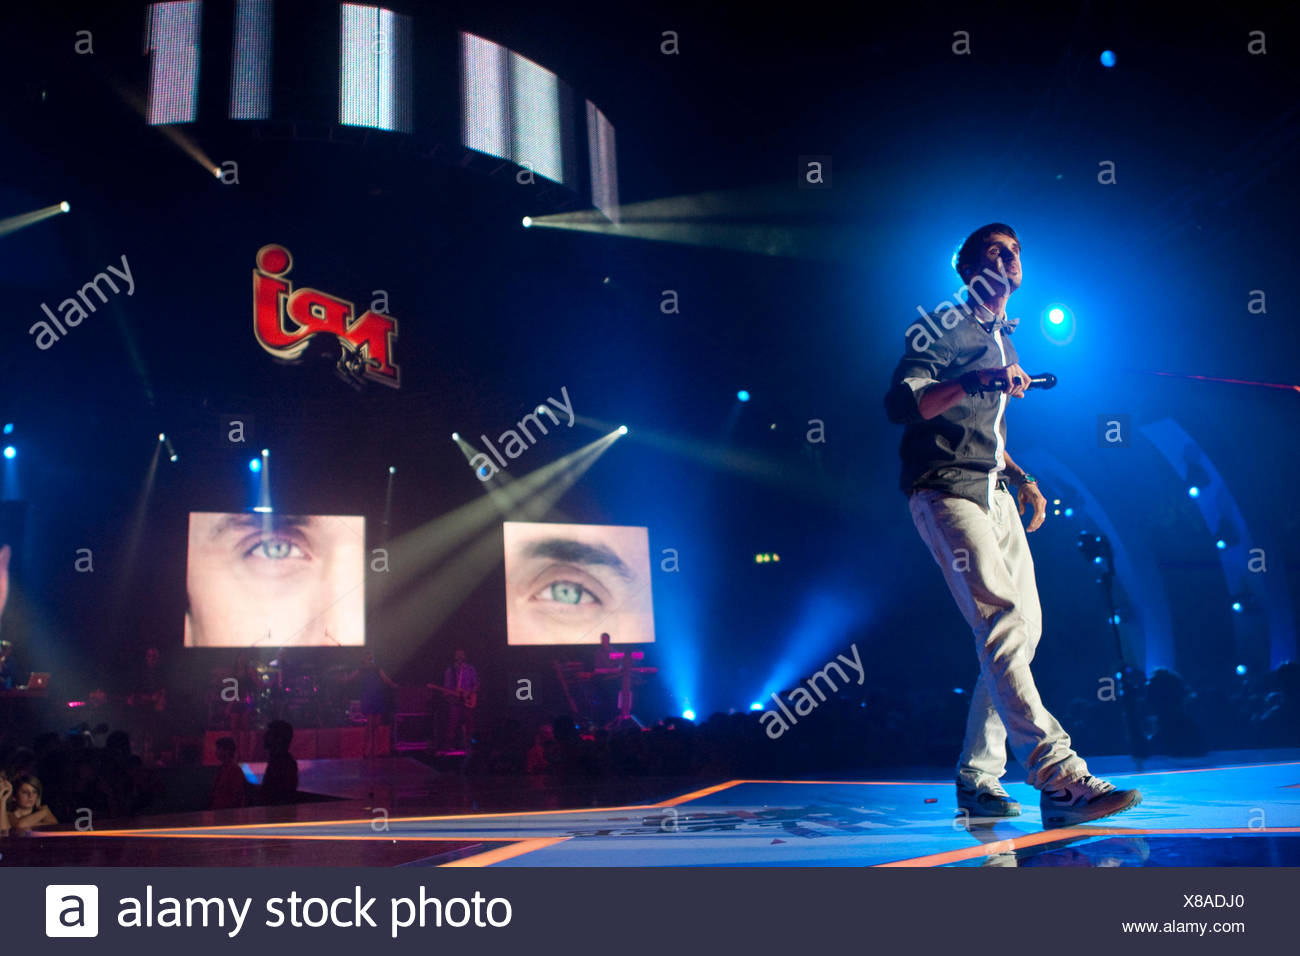 The Swiss soul singer Jan Dettwyler aka Seven live at the Energy Stars For Free event at the Hallenstadion Oerlikon concert hall - Stock Image